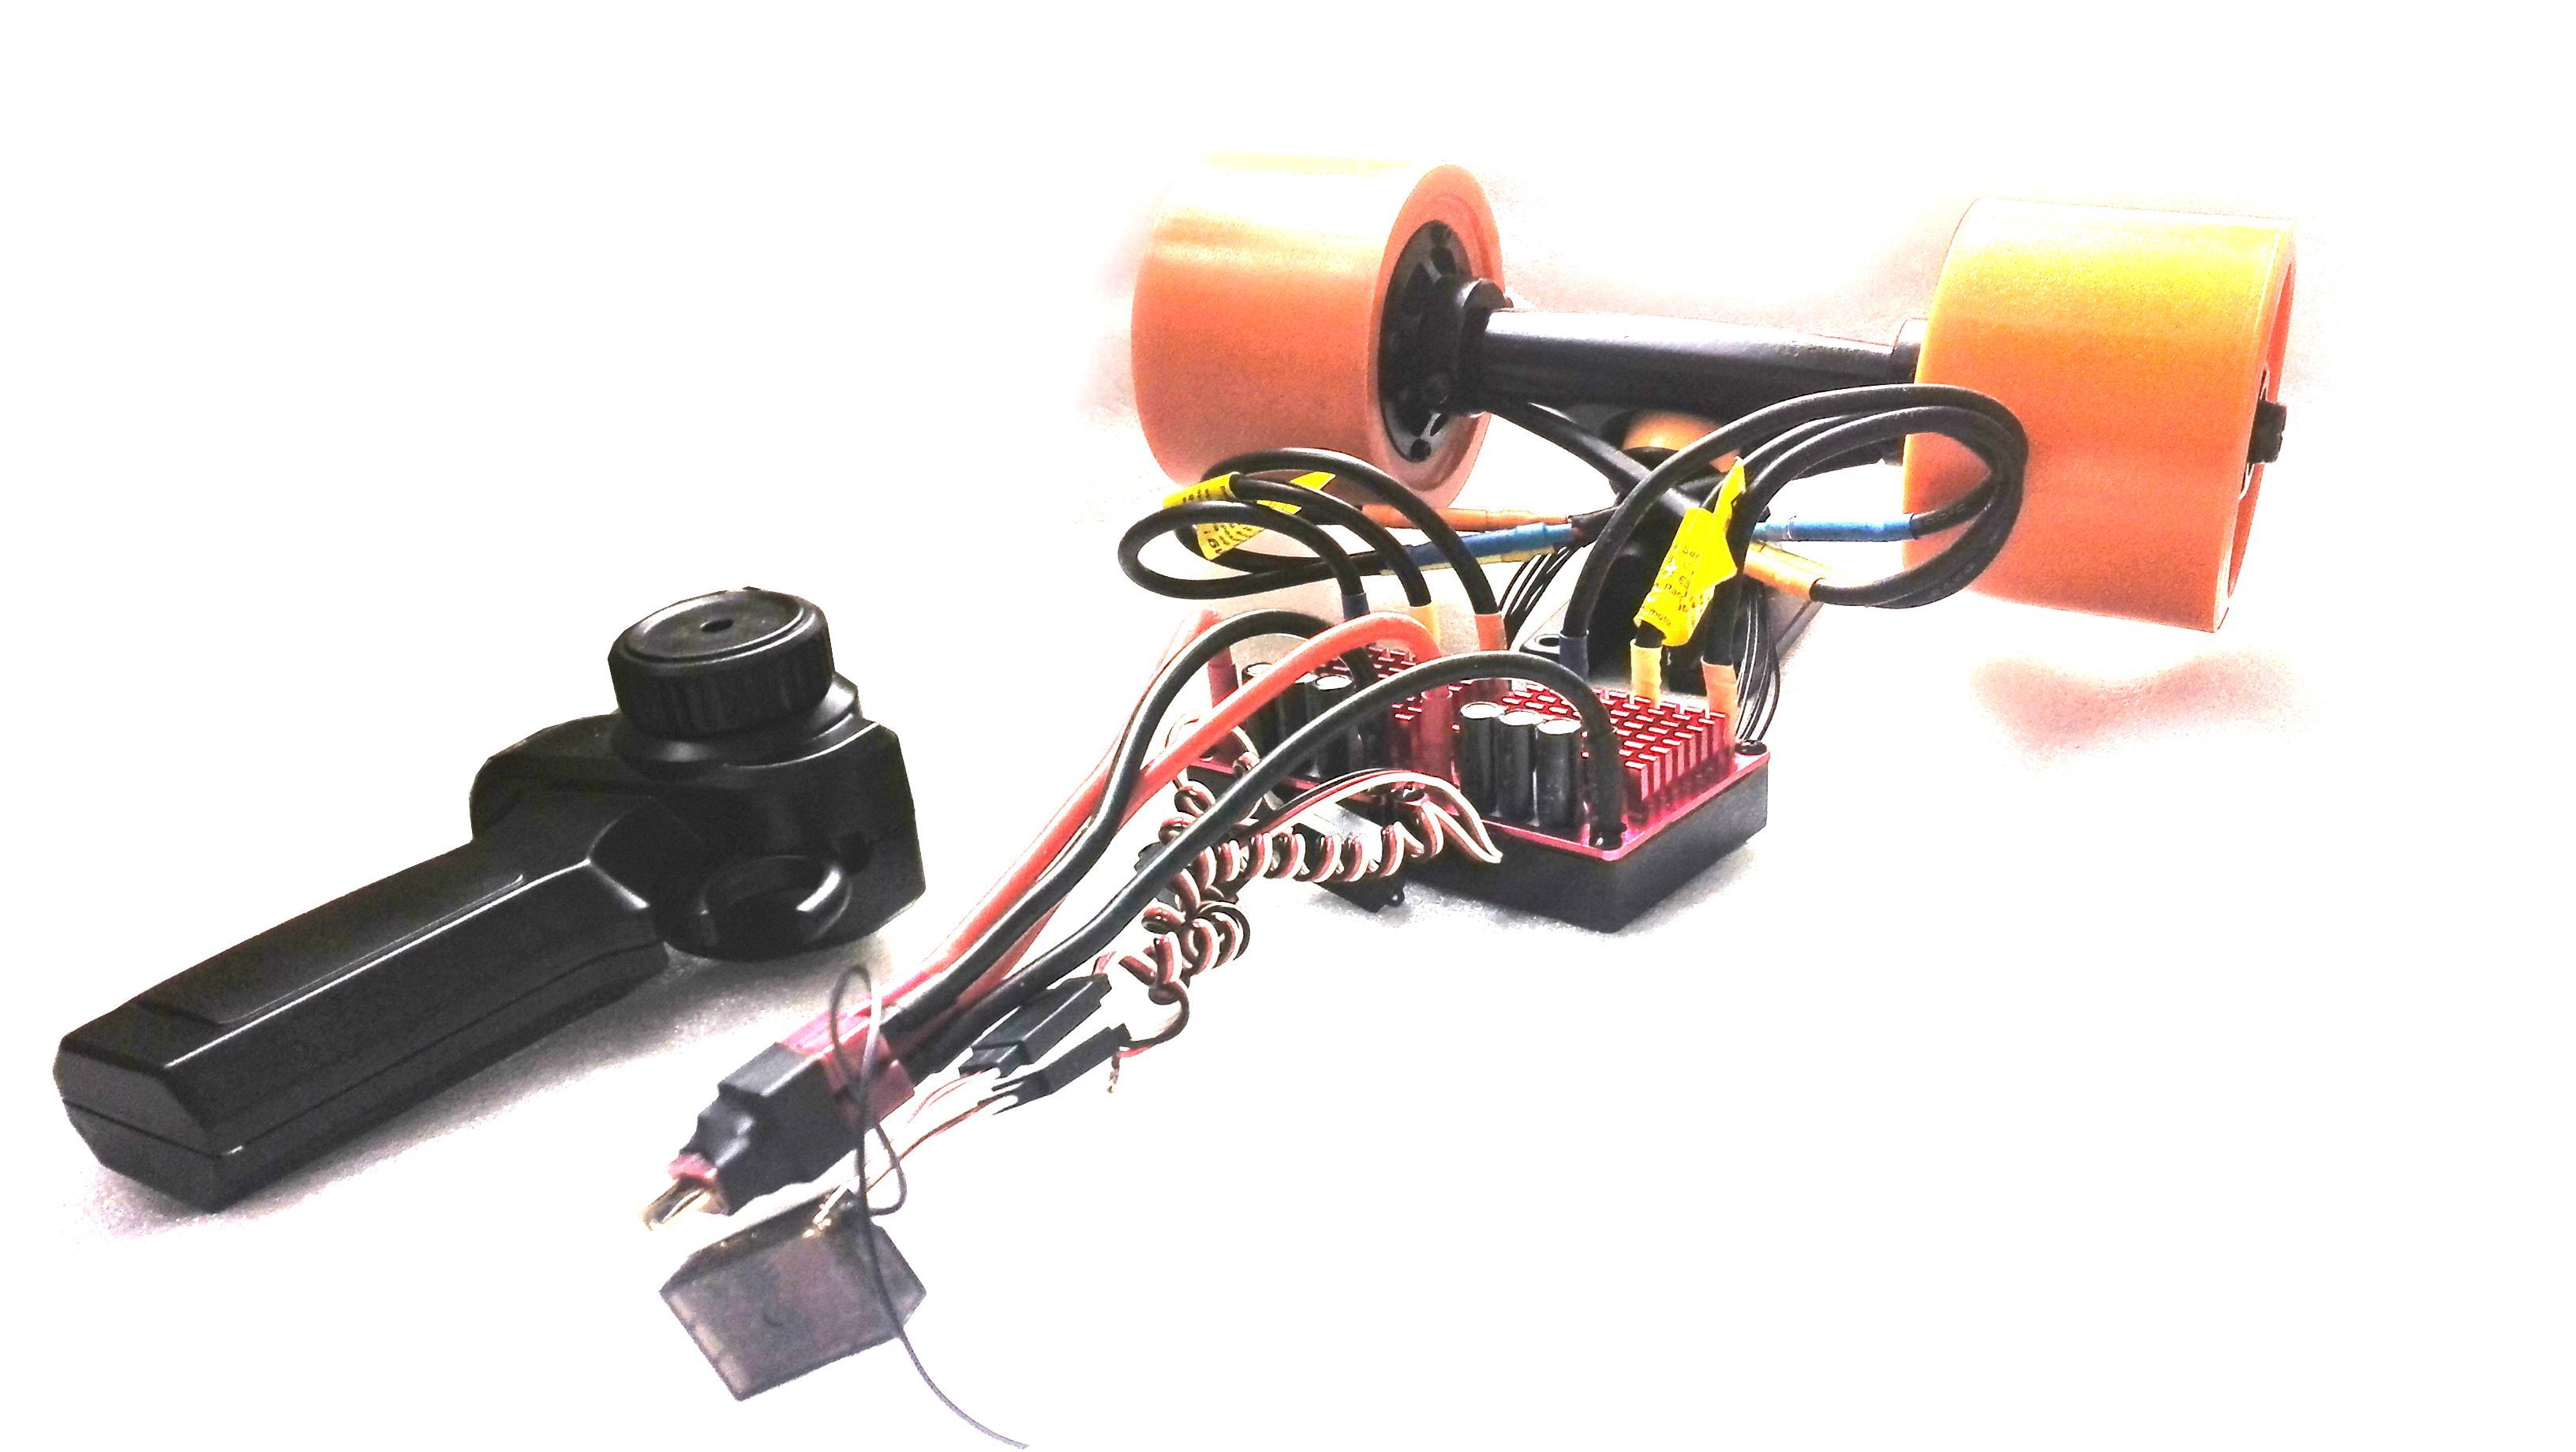 2019 sensored hub wheel motor kit for electric skateboard longboard from haidis10